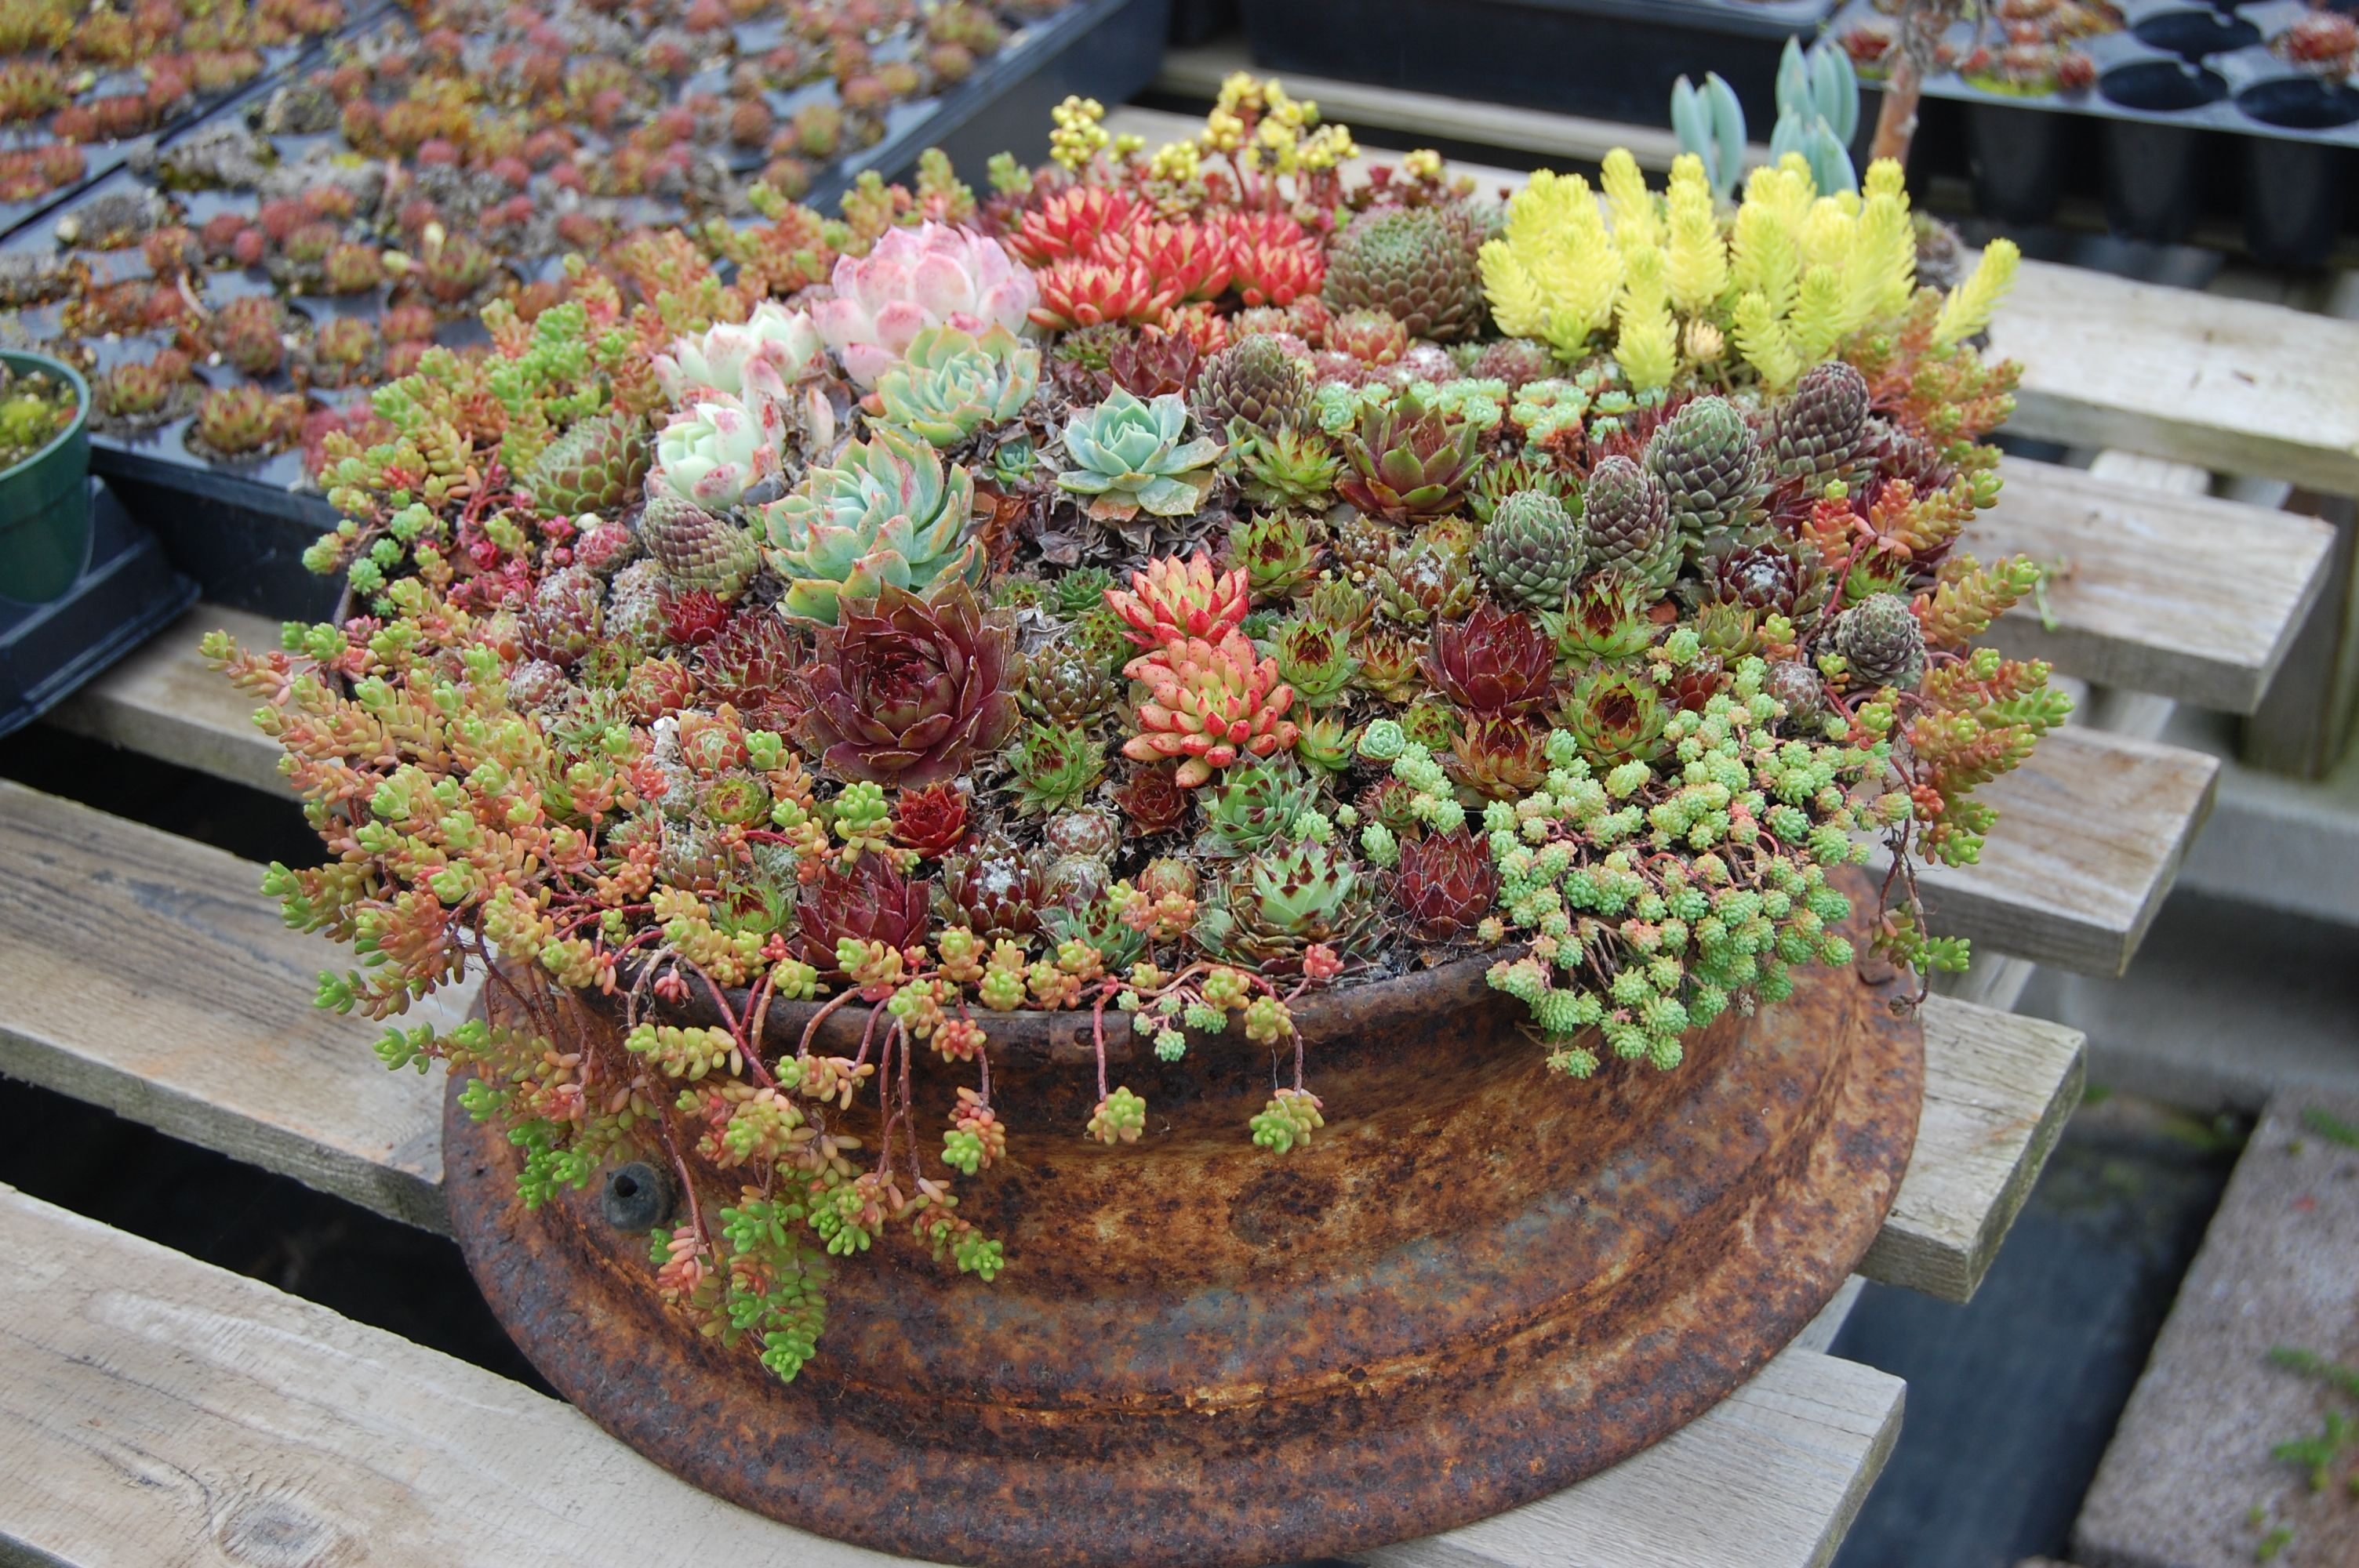 succulents in a rusty tire rim | LAWN N GARDEN IDEAS ...